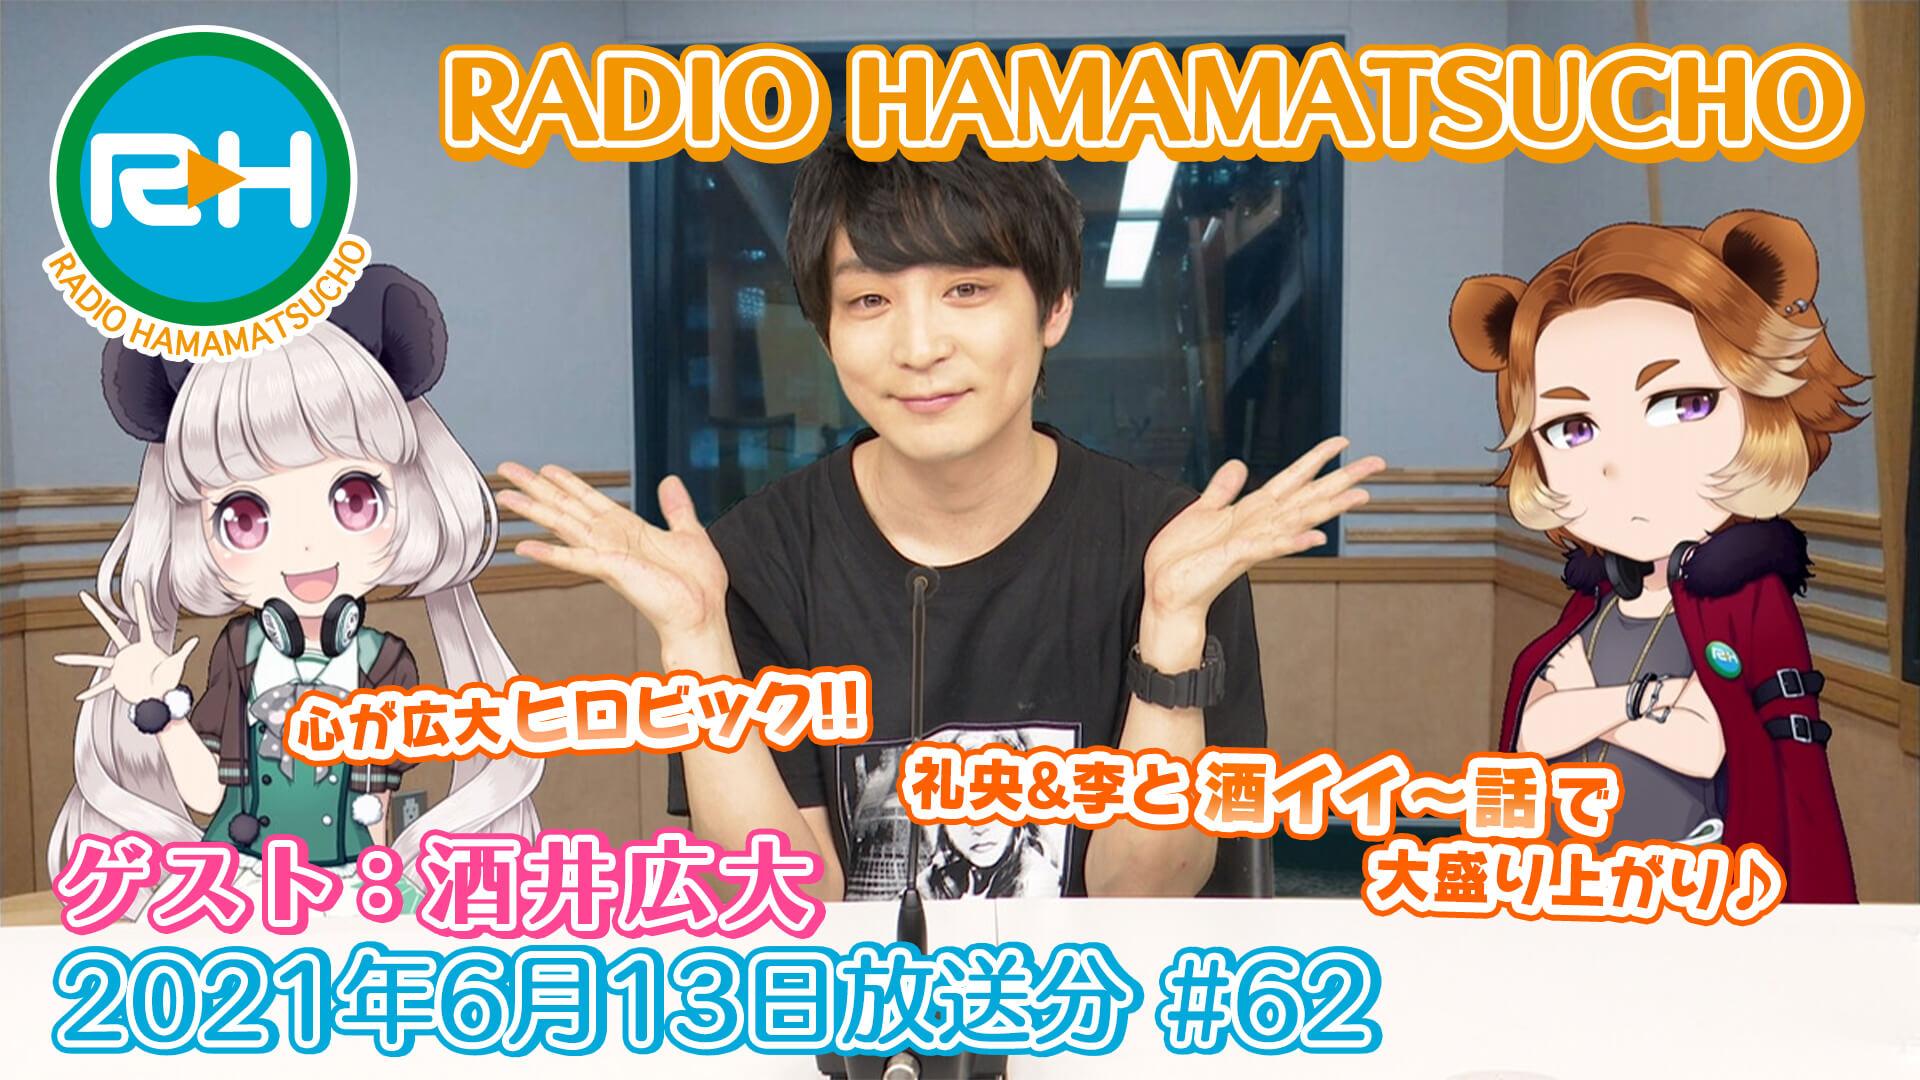 RADIO HAMAMATSUCHO 第62回 (2021年6月13日放送分) ゲスト: 酒井広大